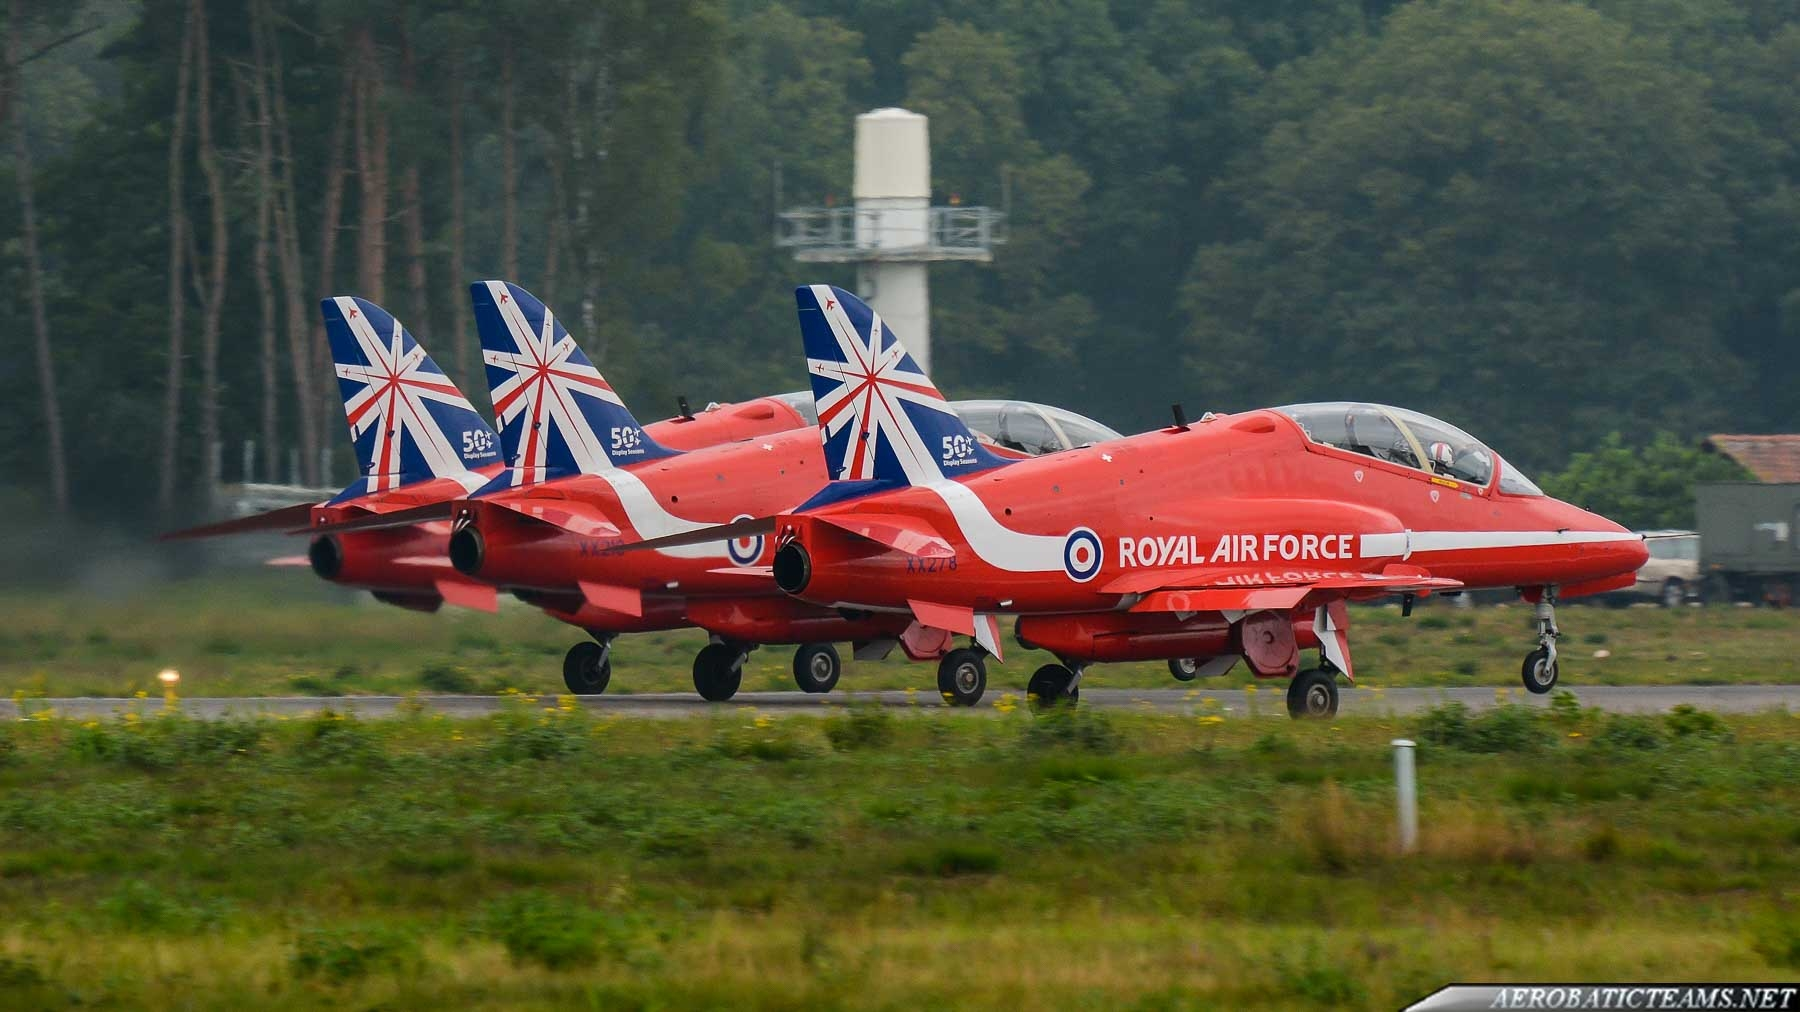 Red Arrows Hawk in 50th display season livery